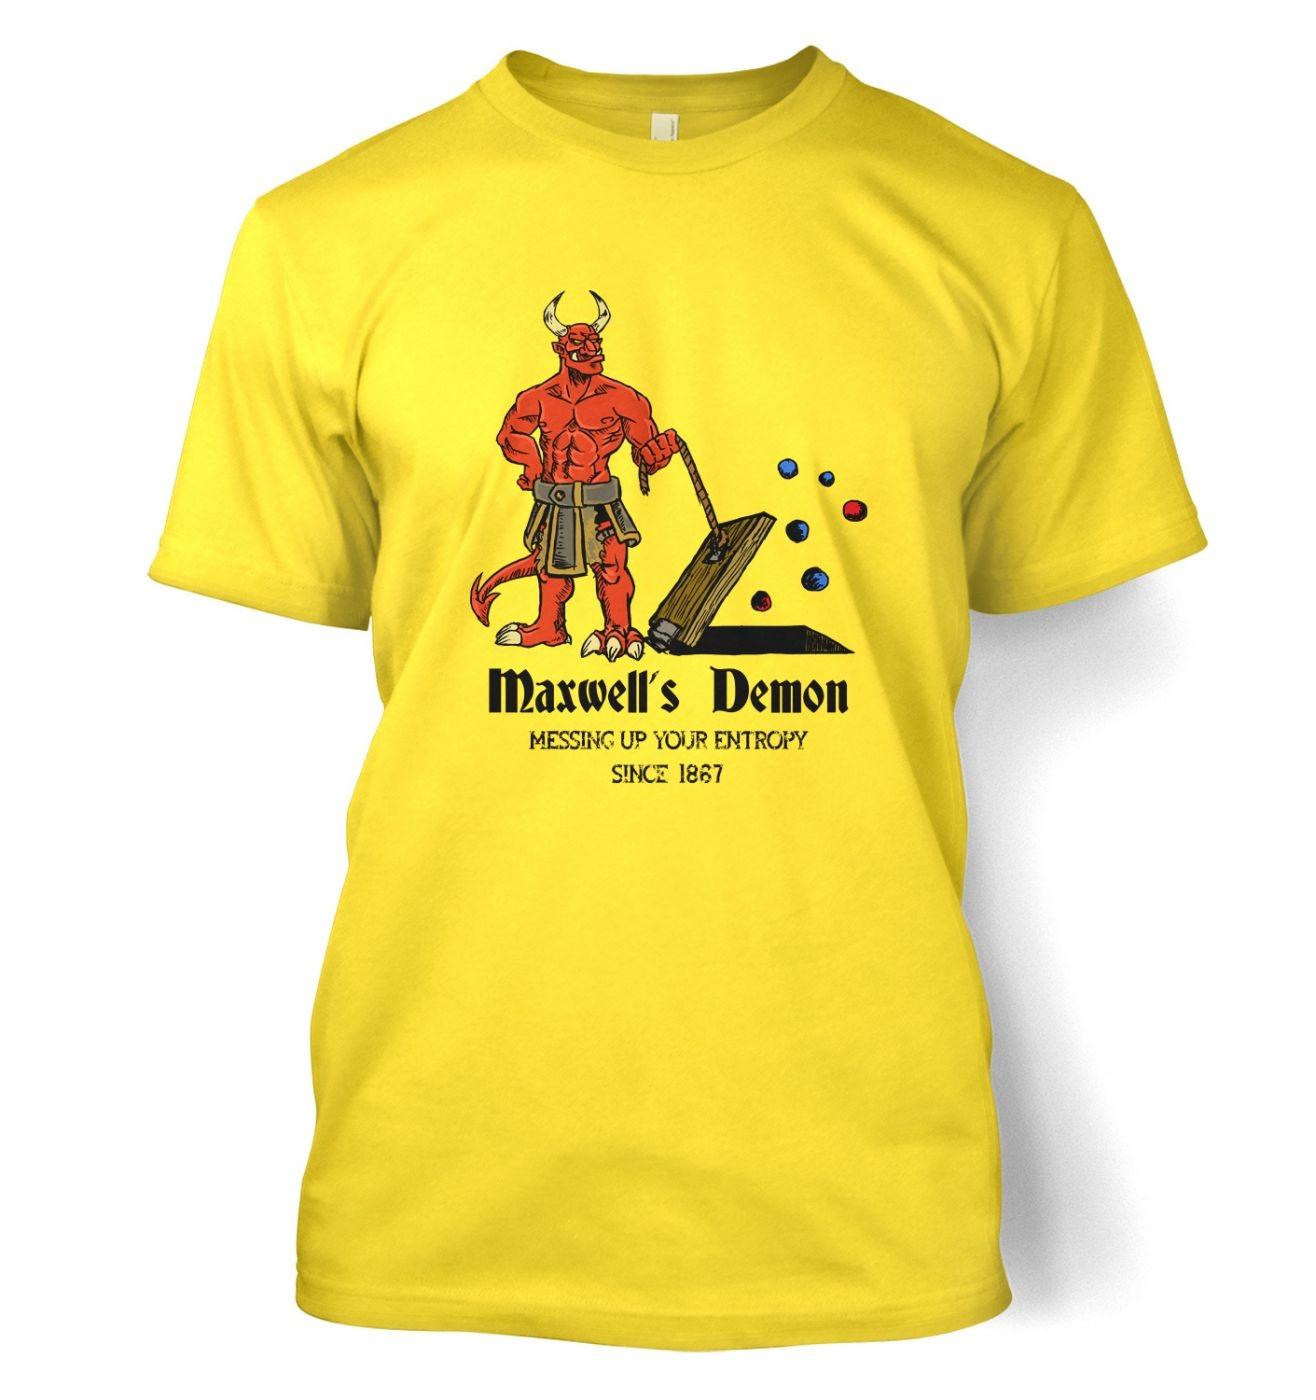 Maxwell's Demon t-shirt